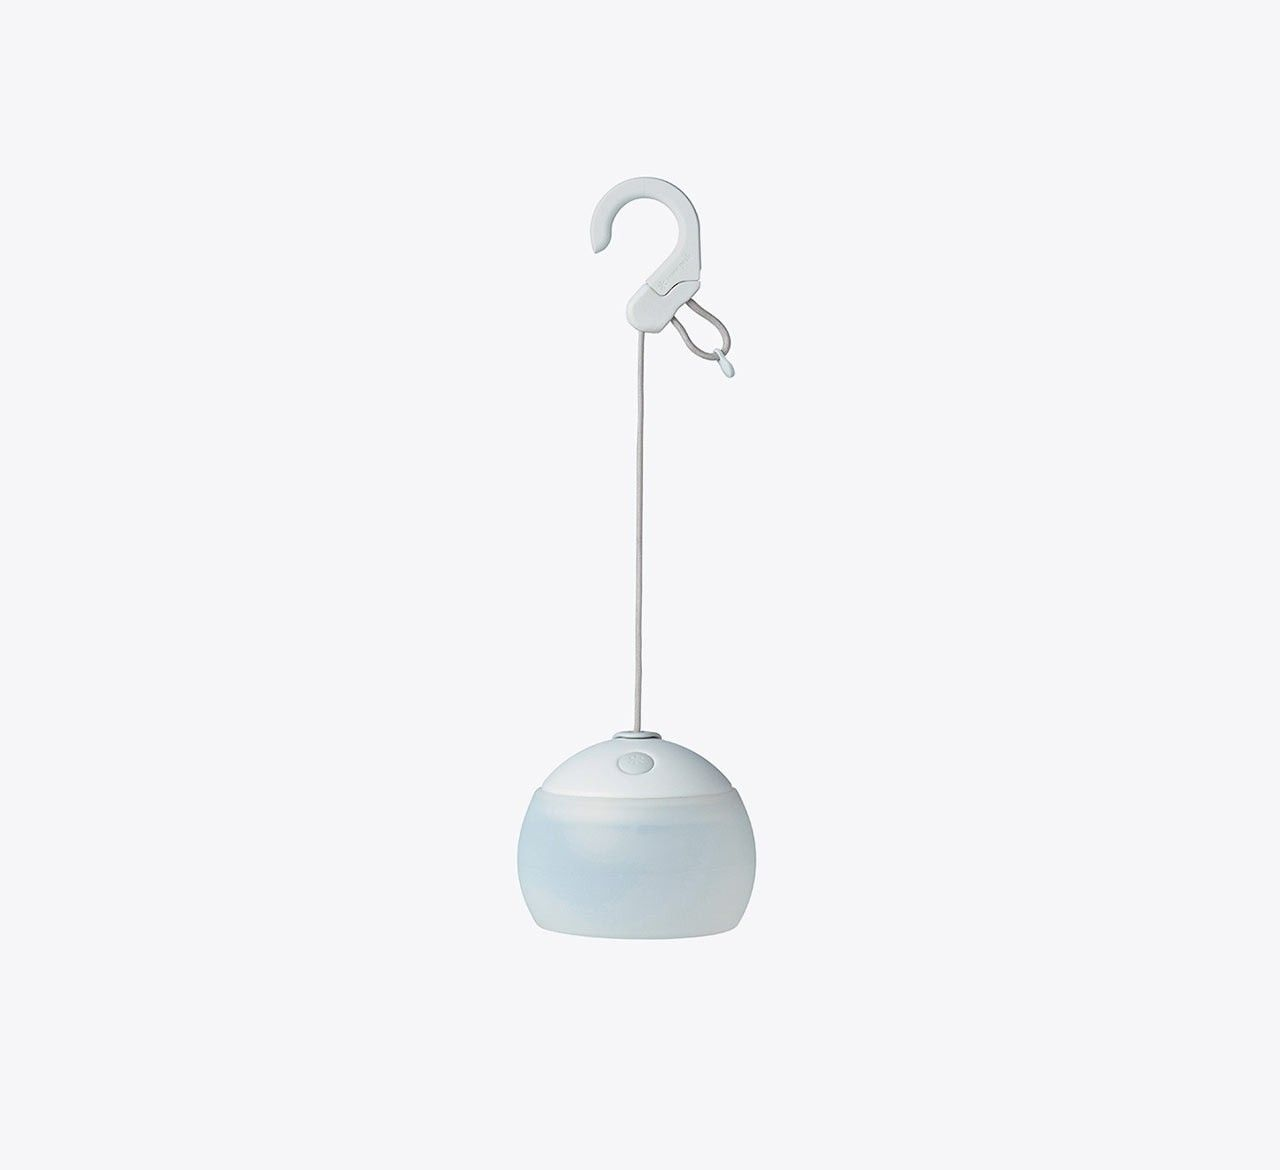 SnowPeak Hozuki Lantern